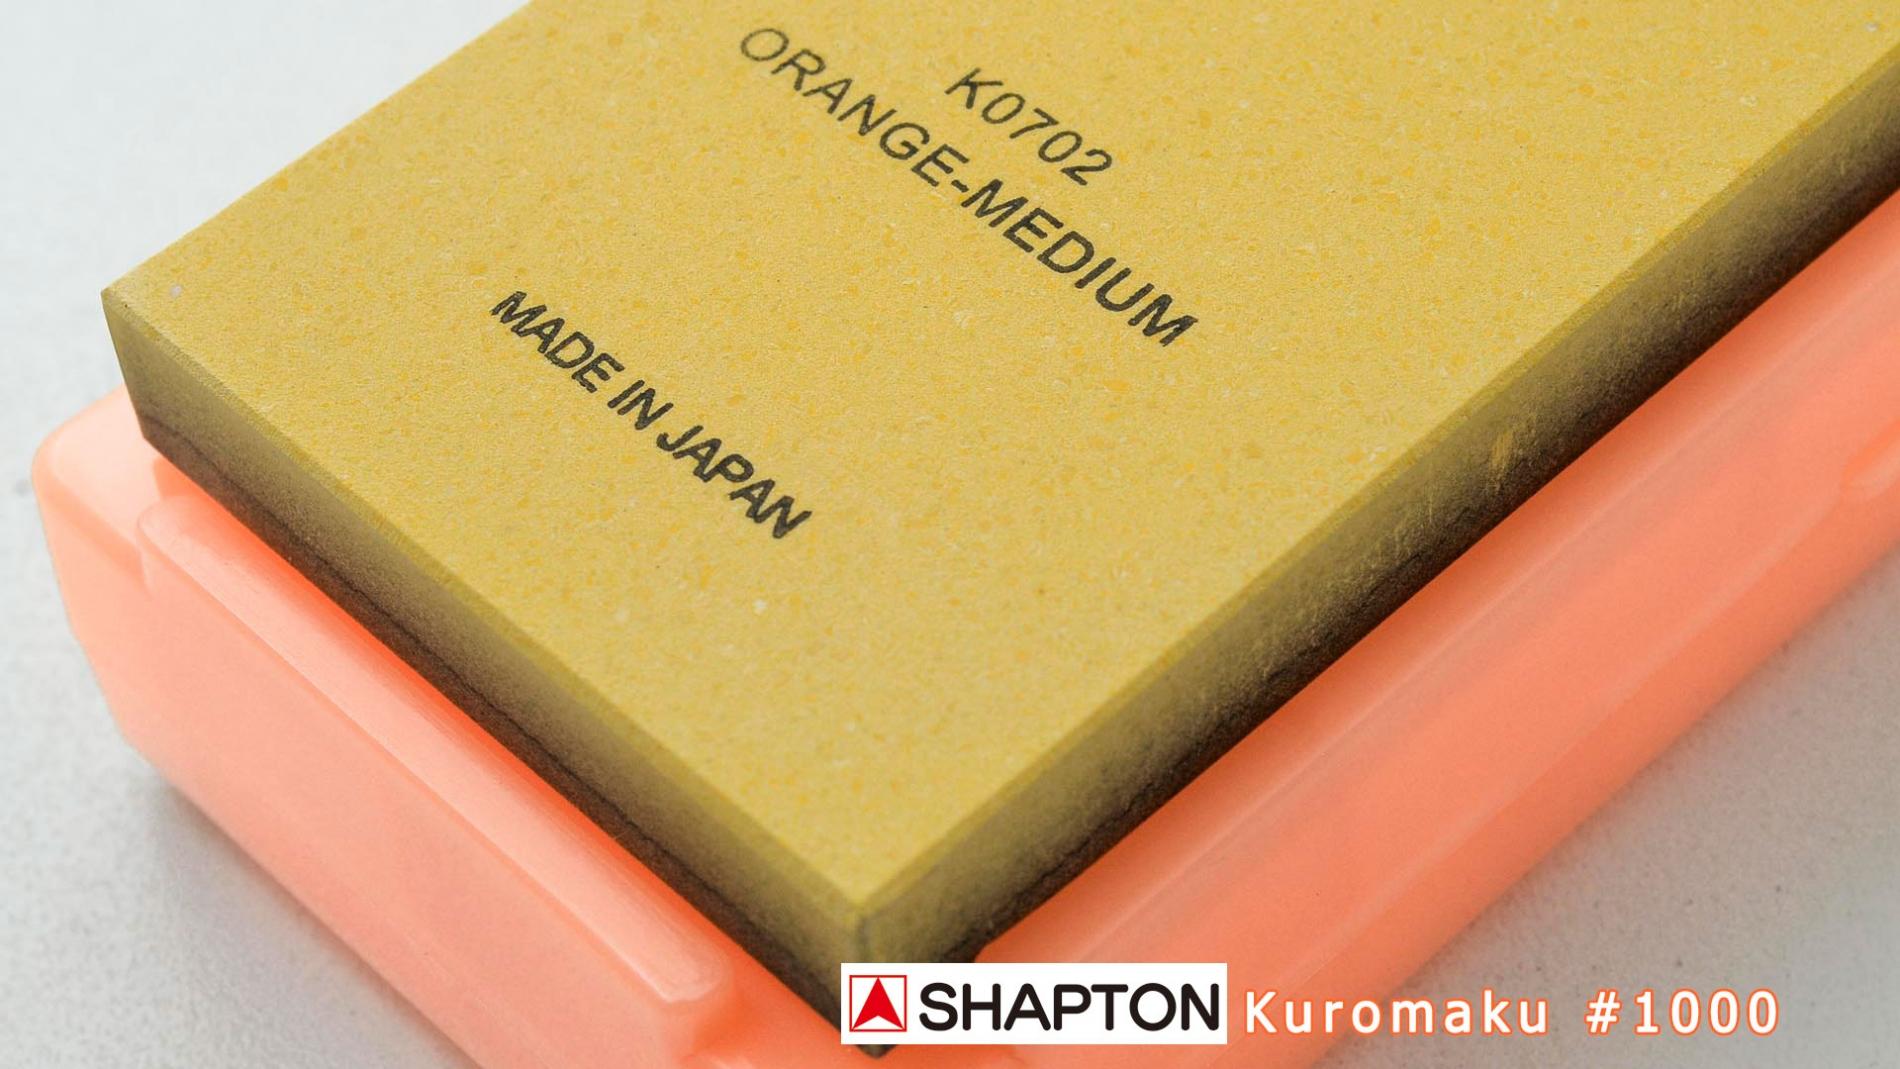 K0702-Piedra de afilar 1000 Shapton Kuromaku K0702-max-3.